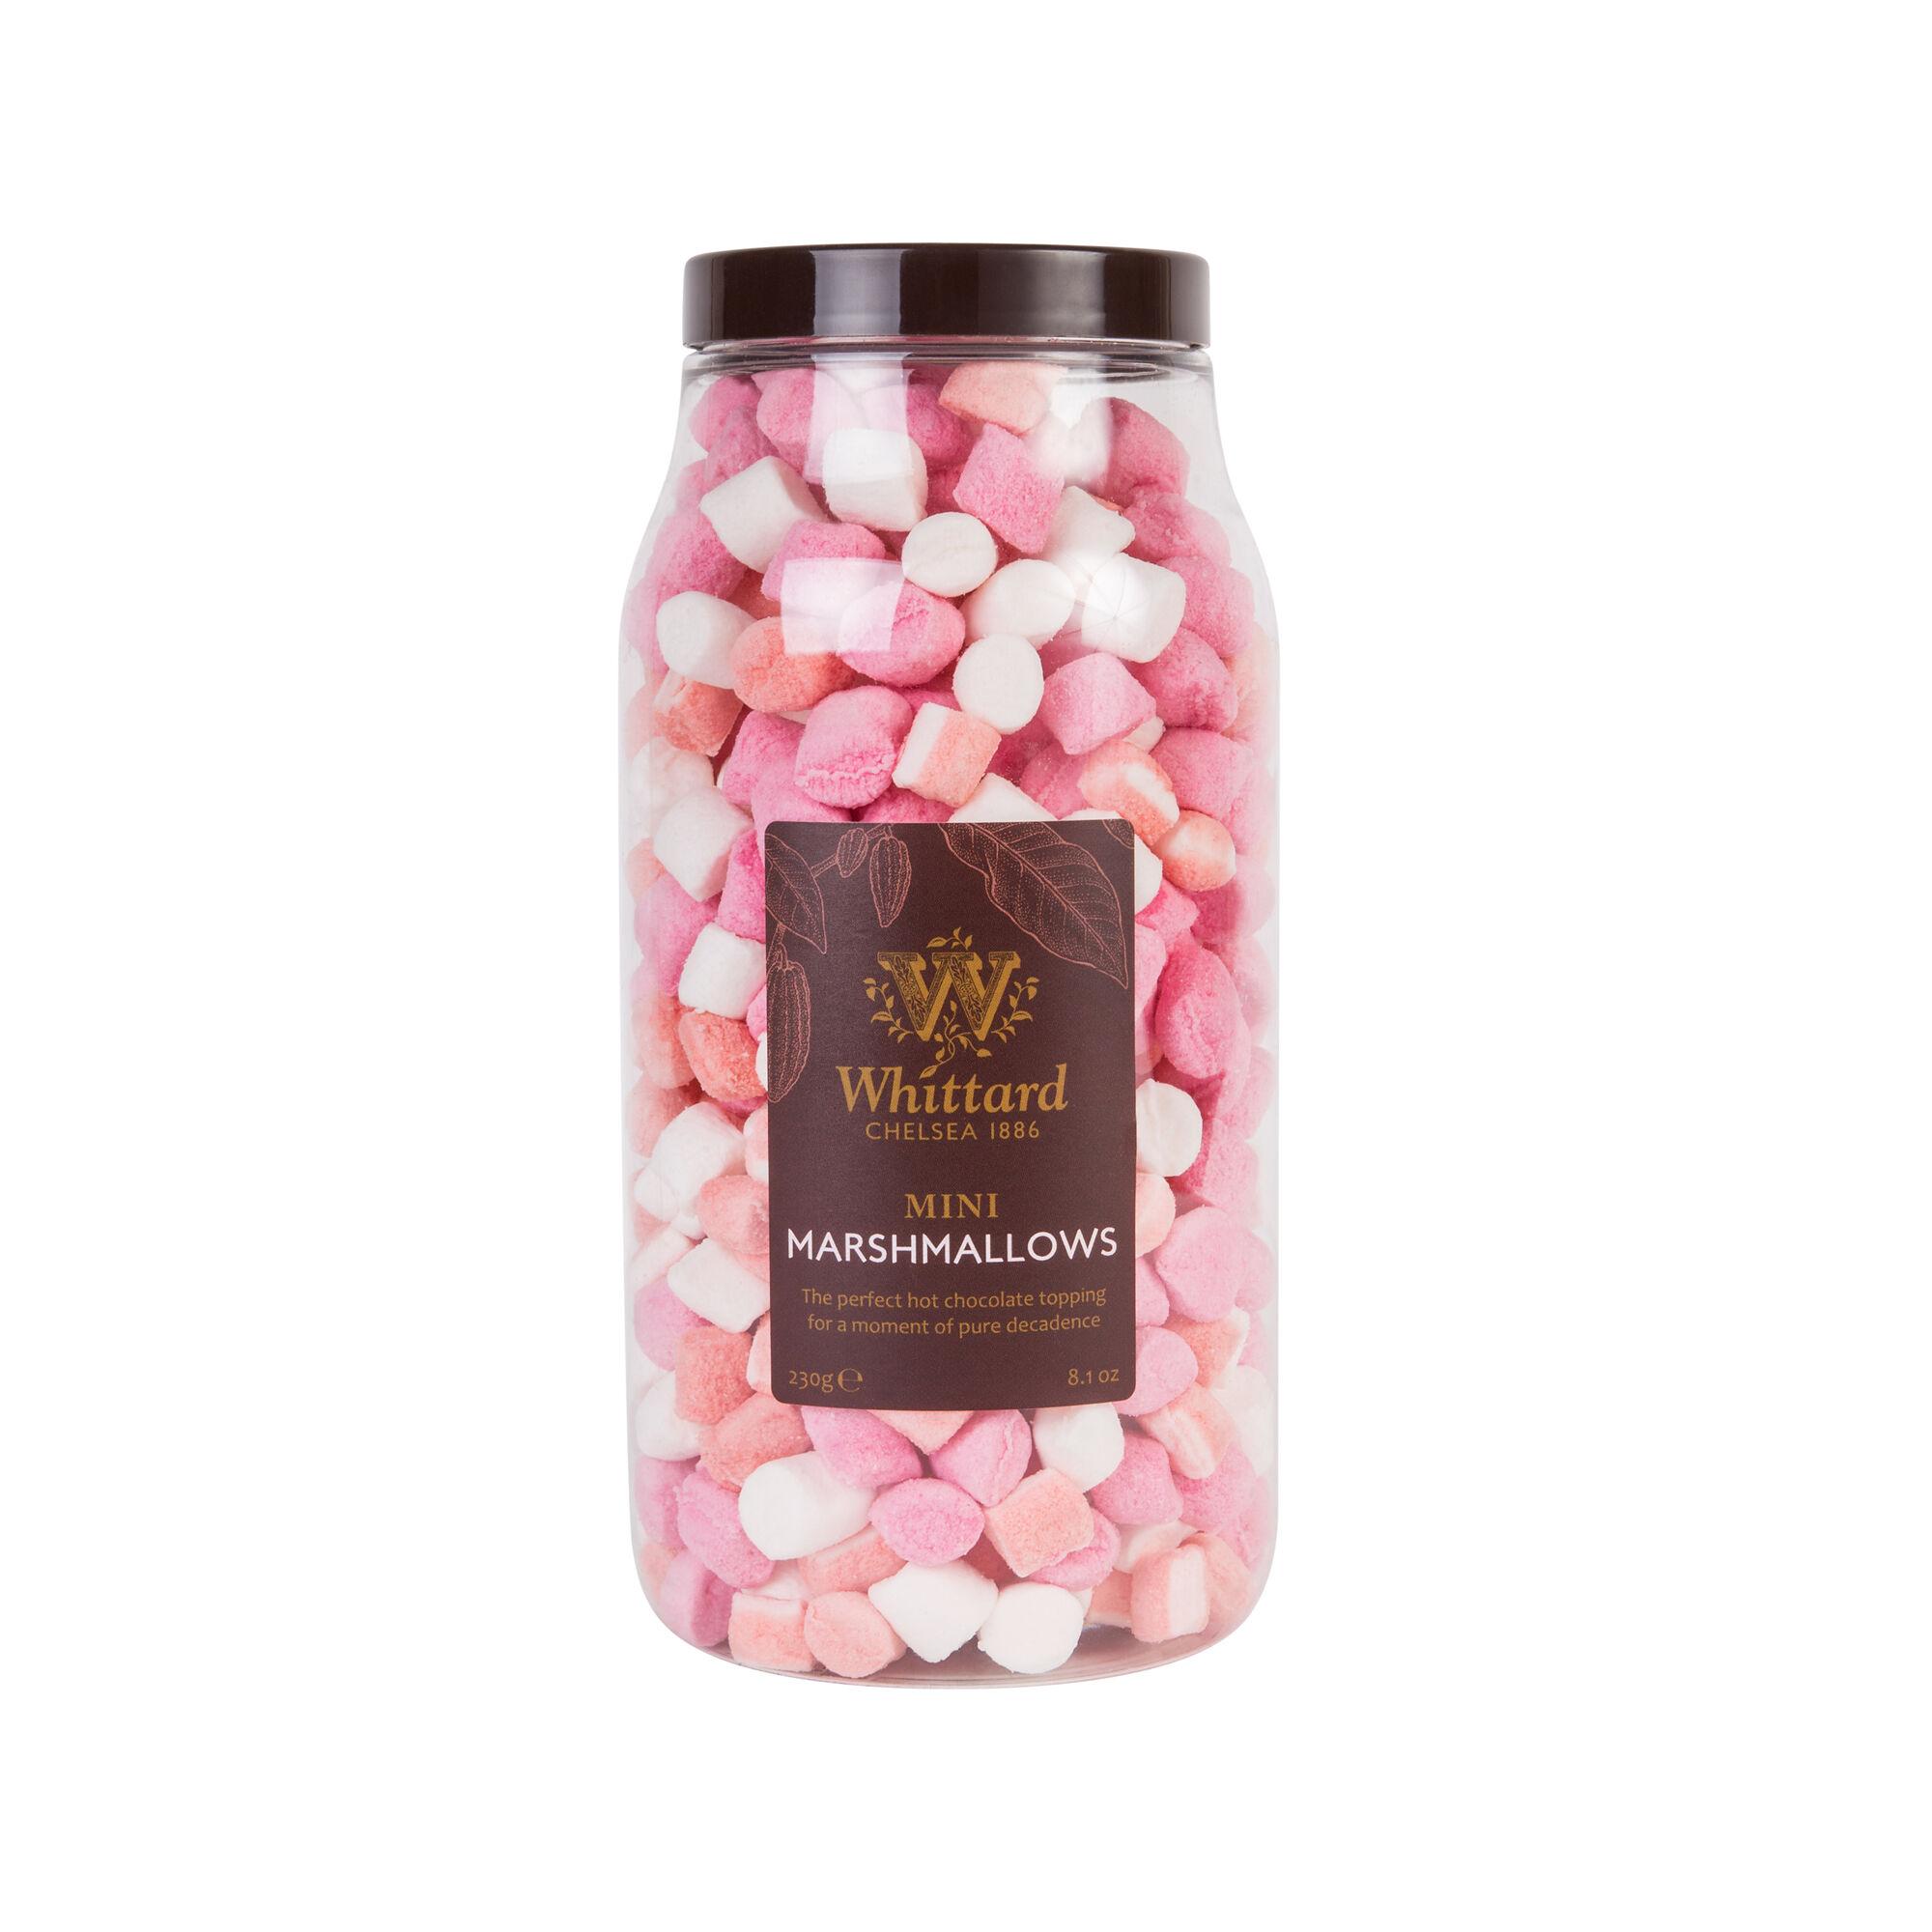 Standard produsent Mini Marshmallows